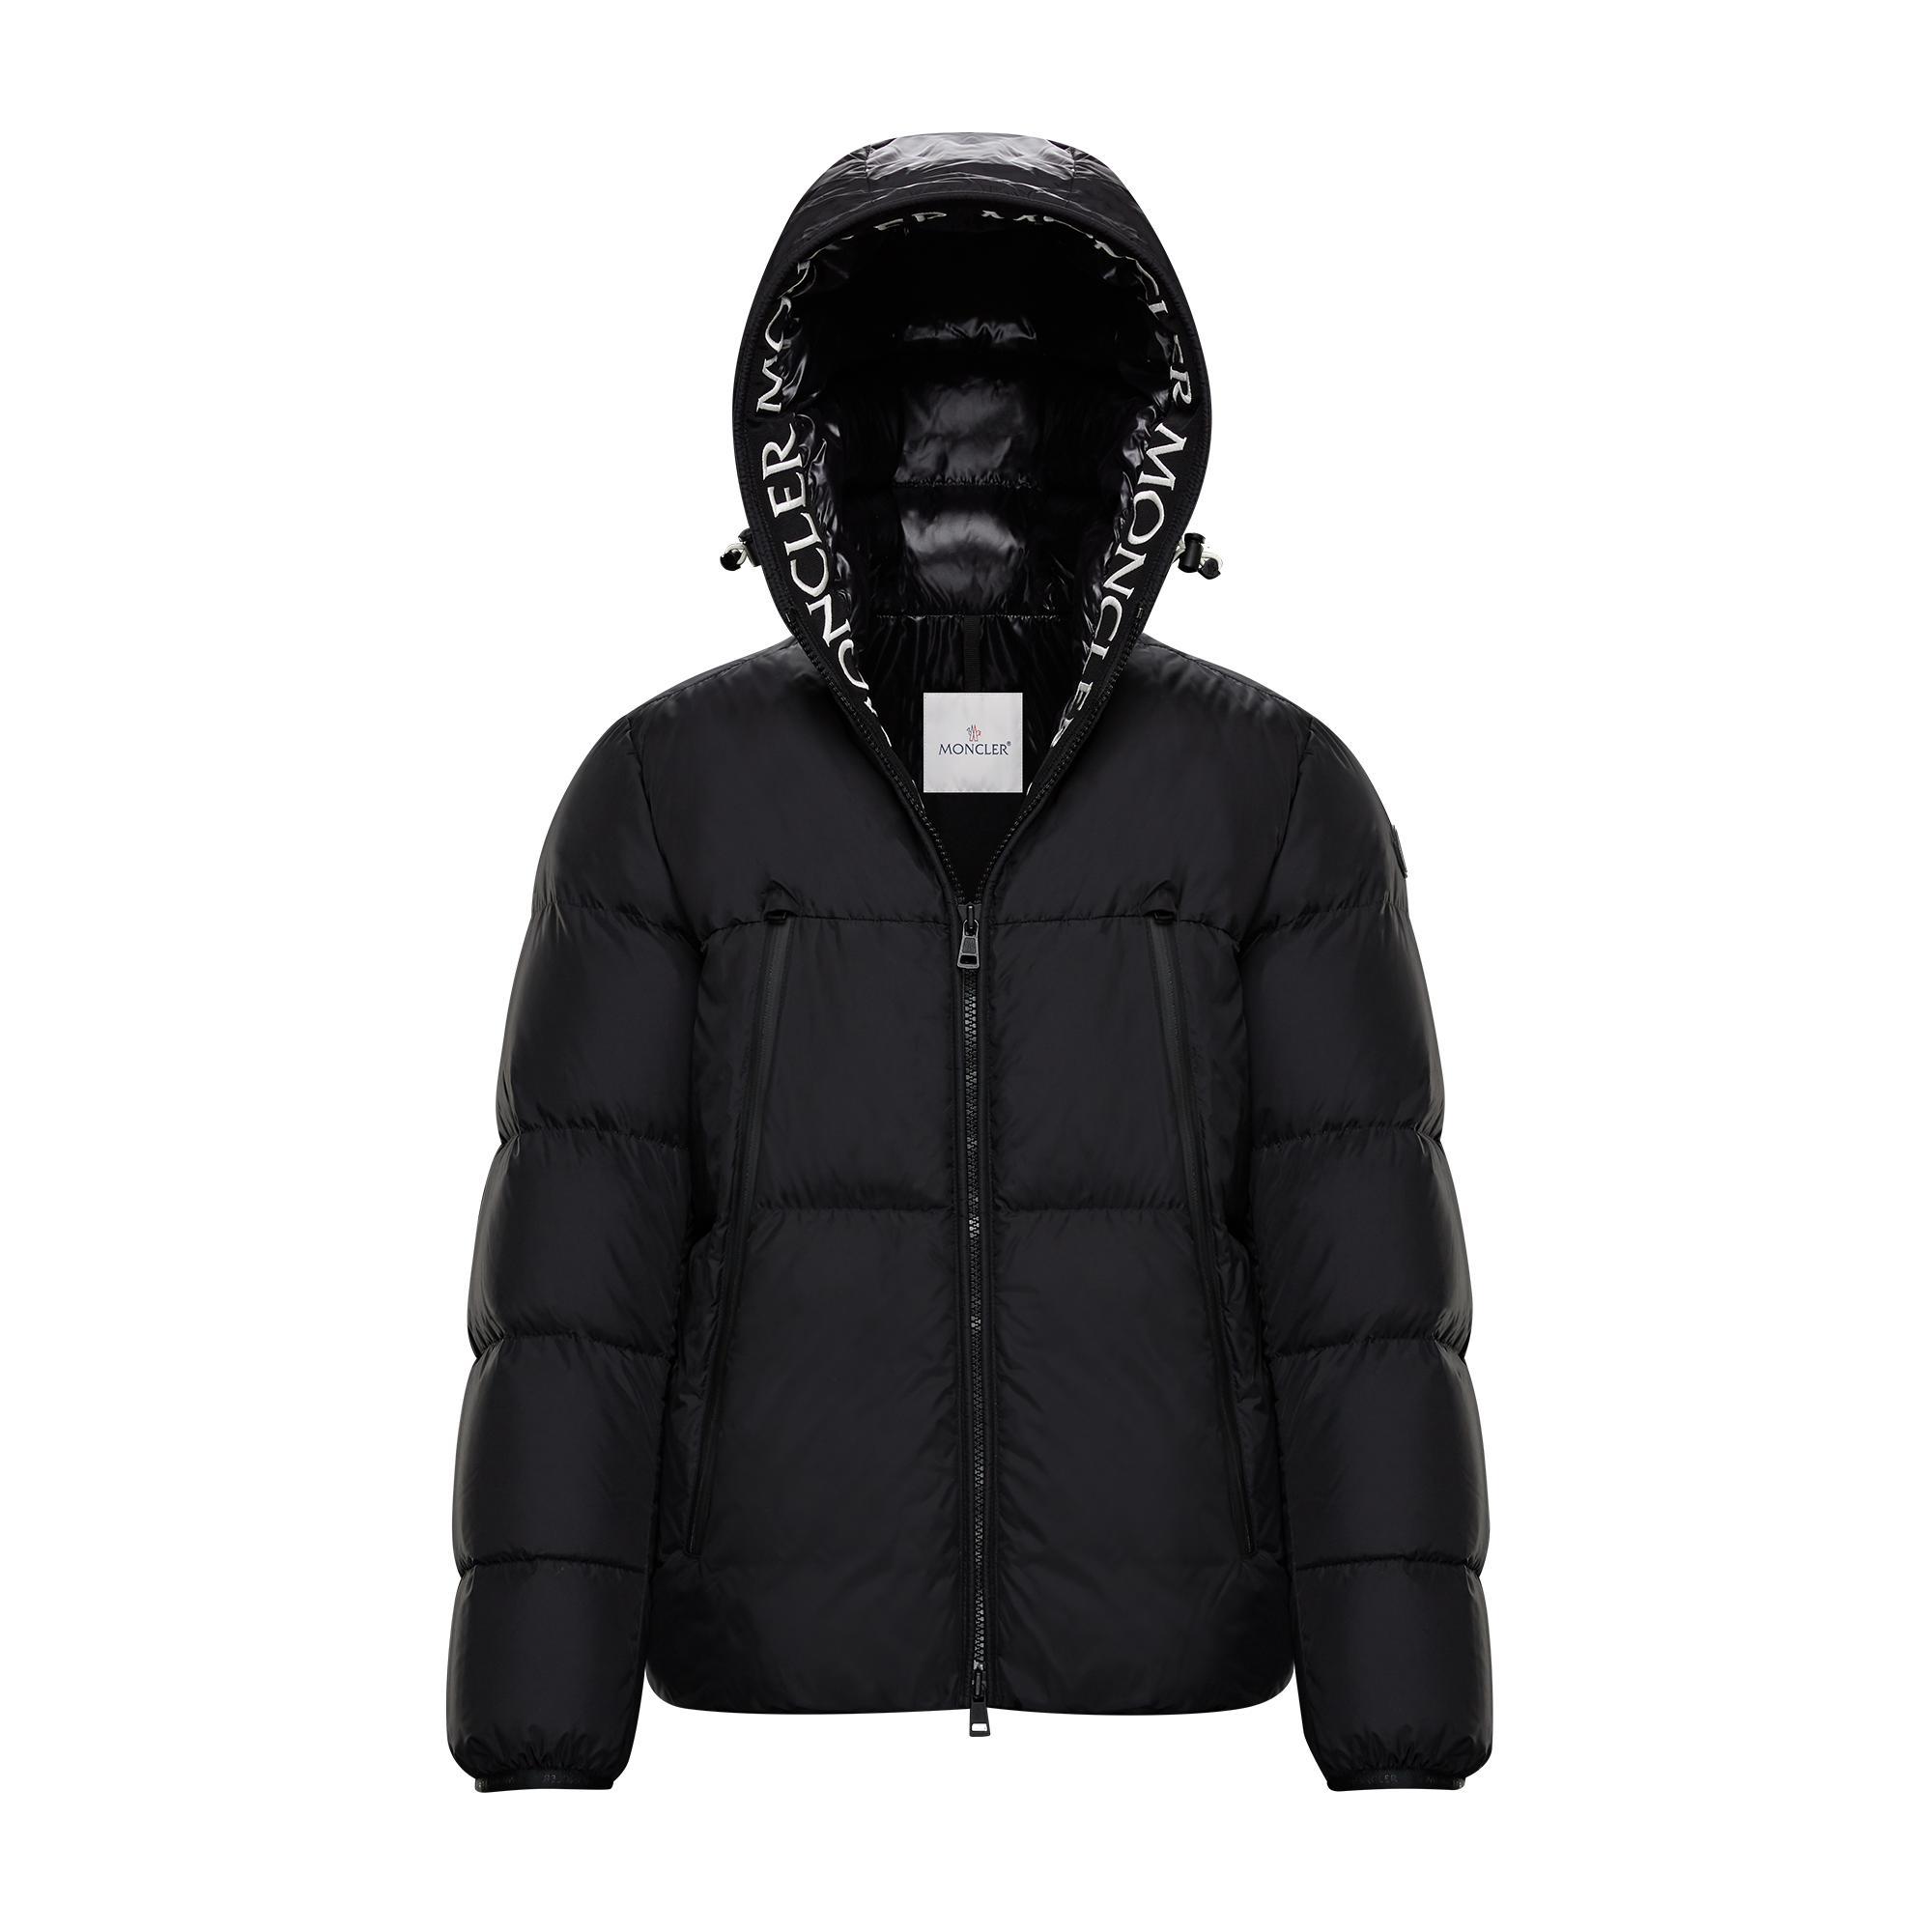 montcla coat